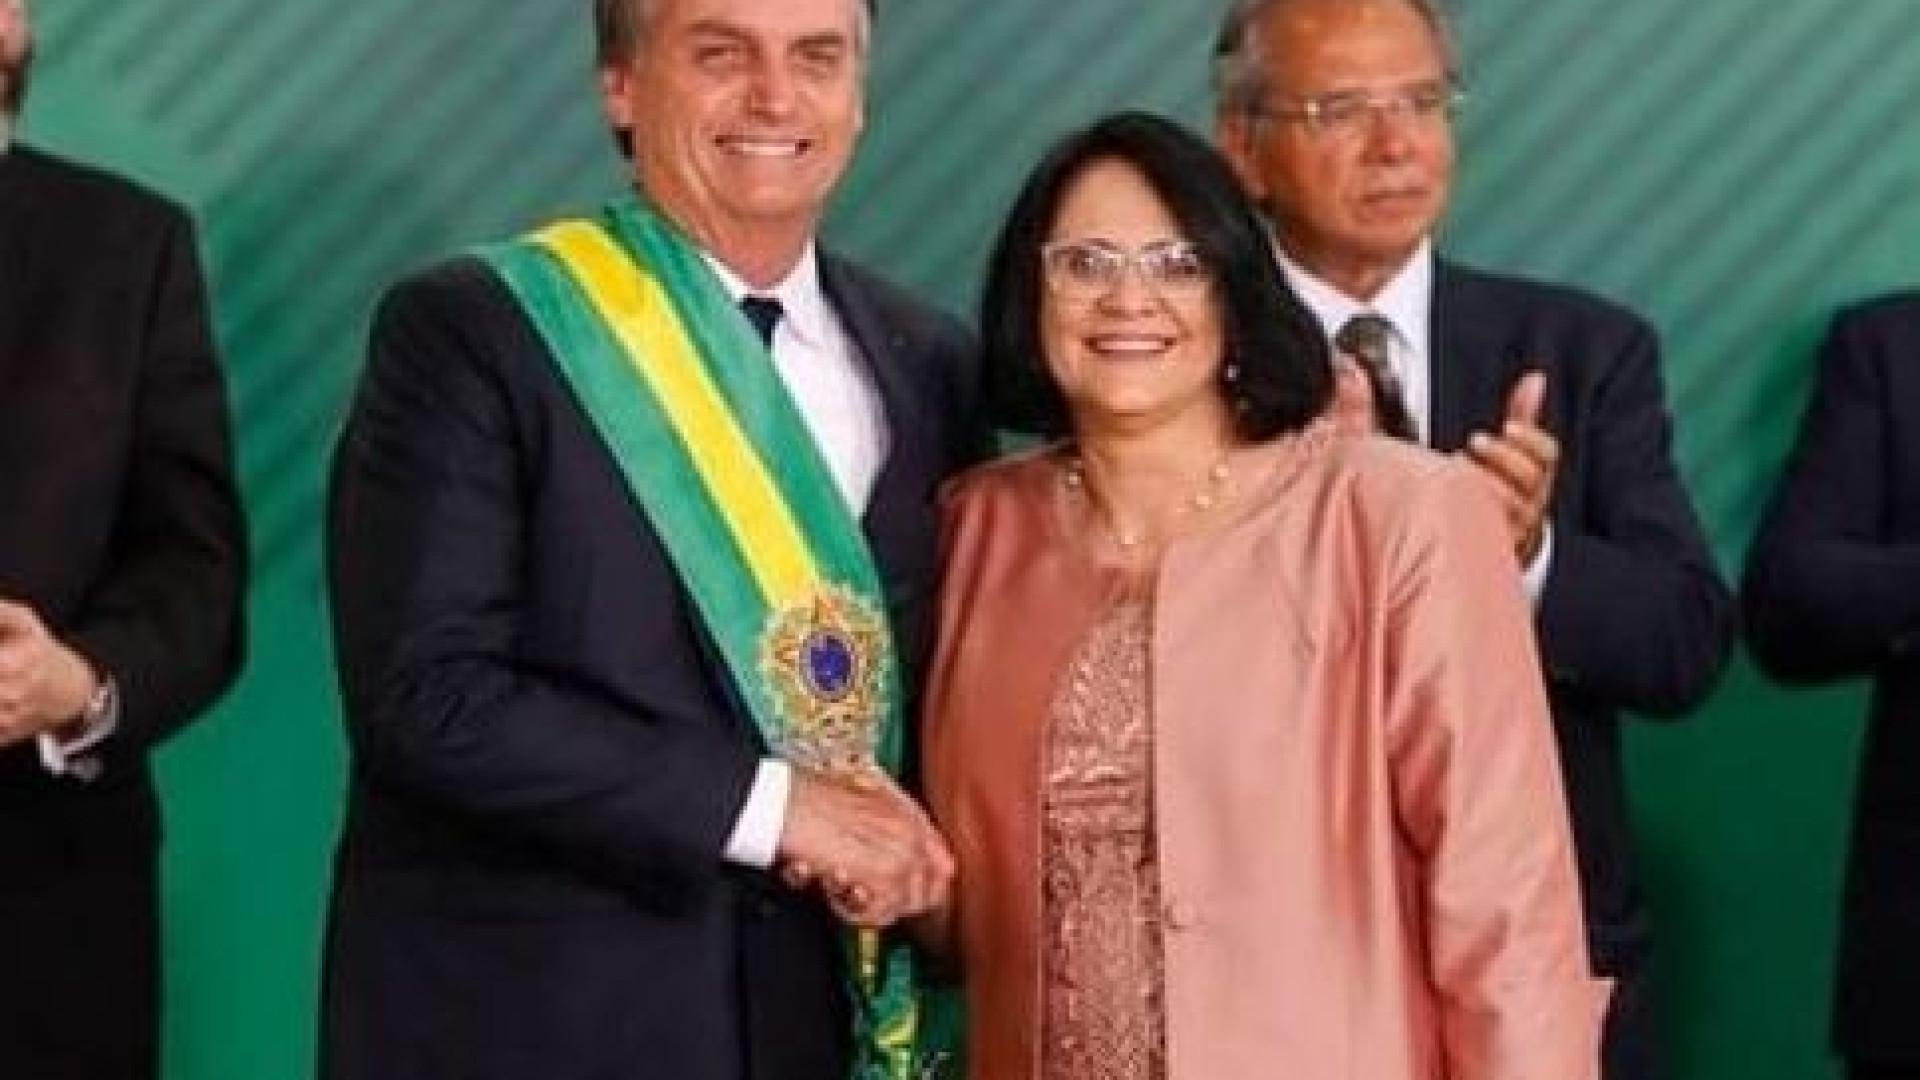 Polémica ministra de Bolsonaro terá mentido sobre títulos académicos